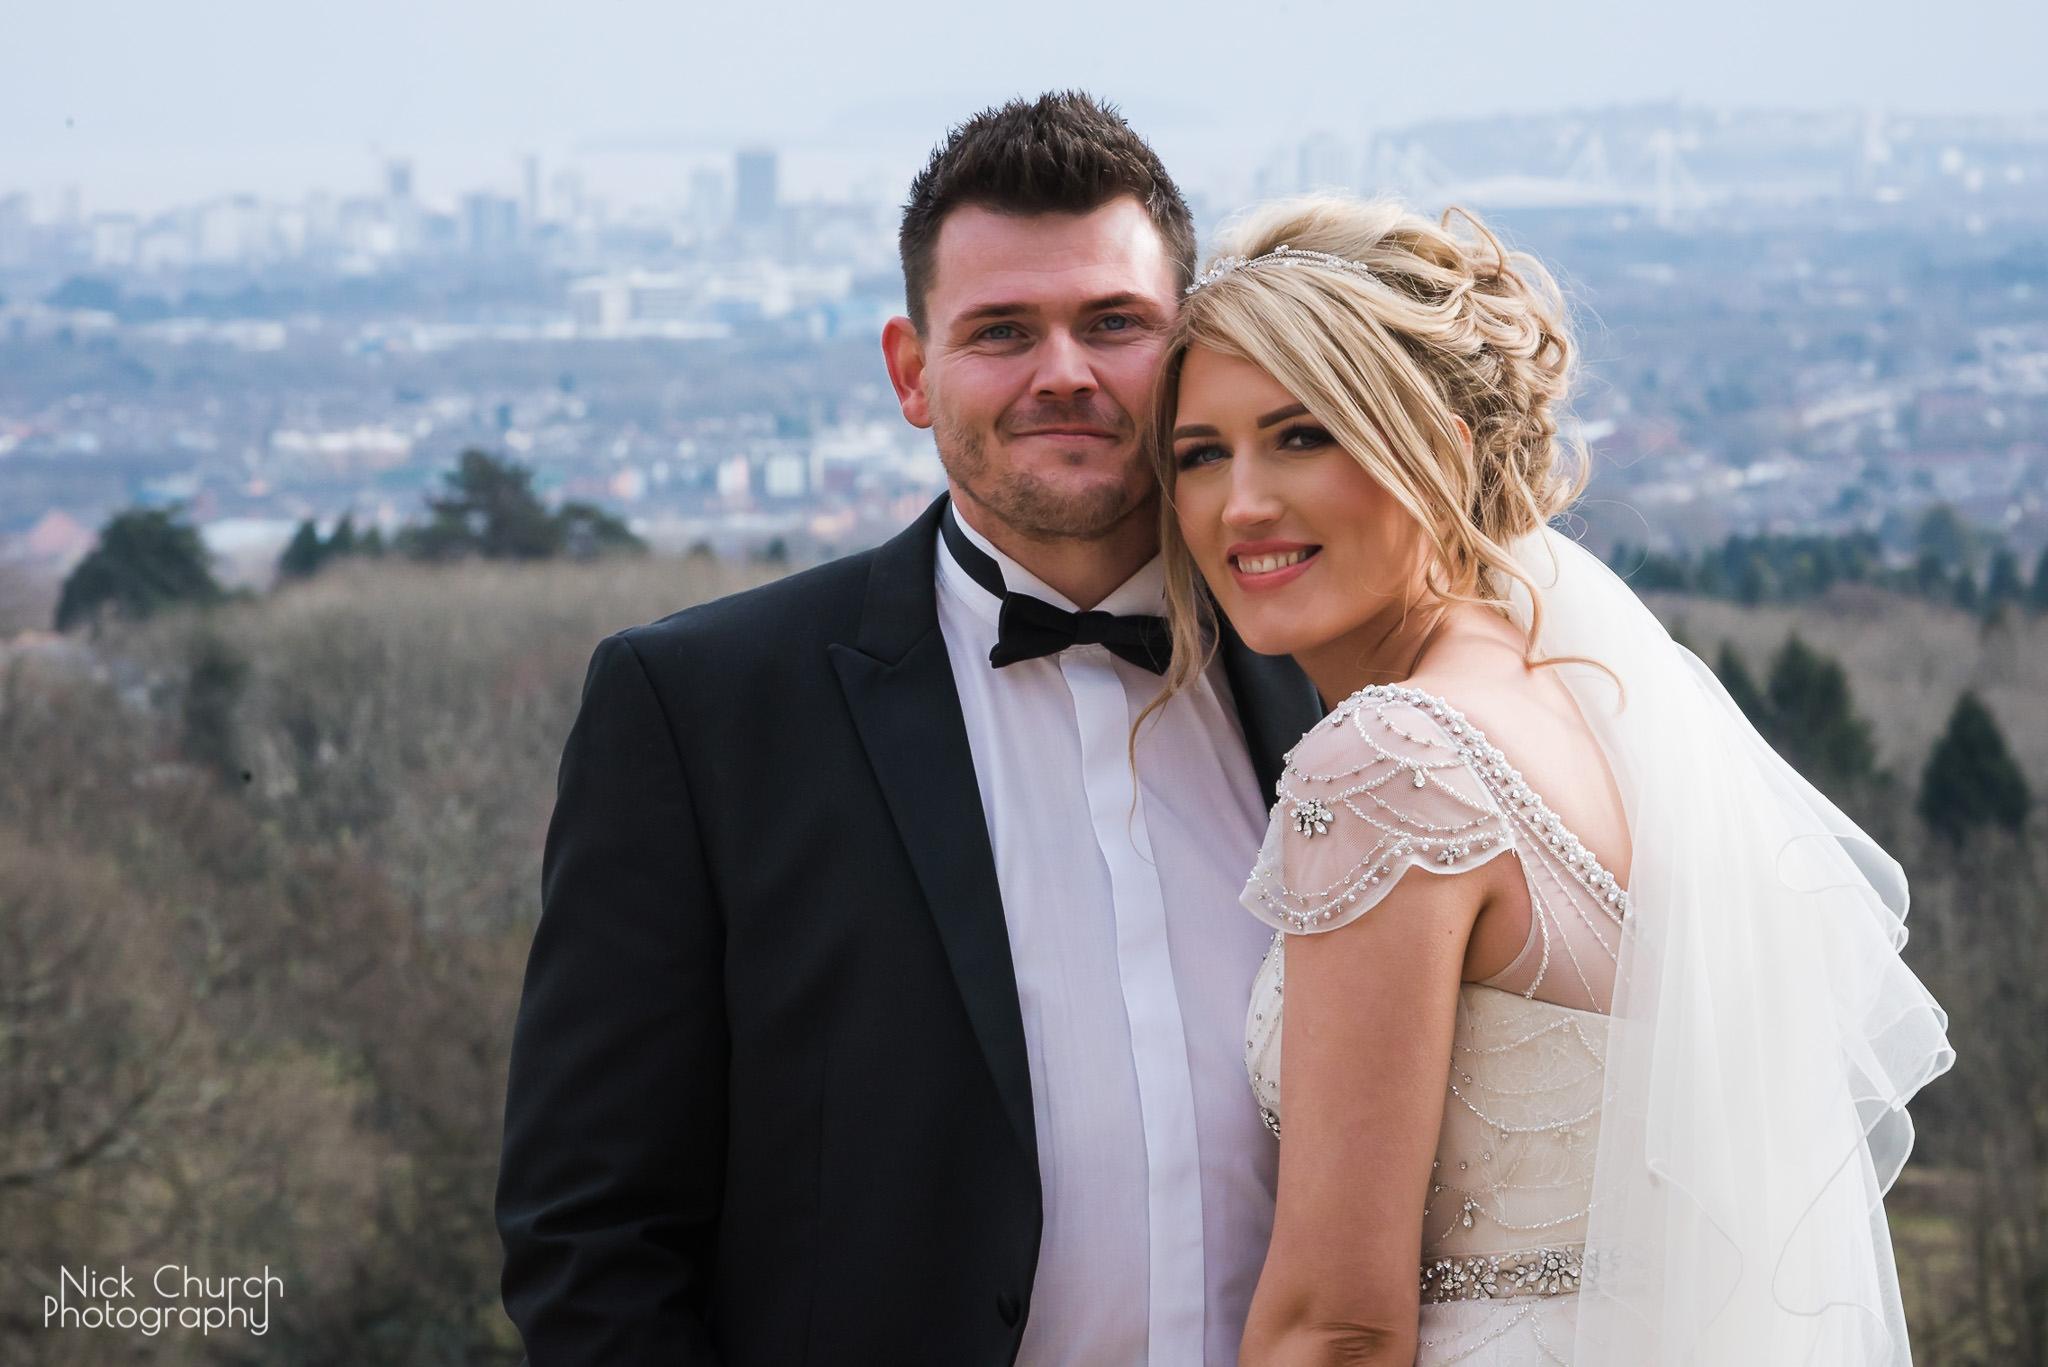 NC-20180317-stacy-and-mike-wedding-1302.jpg